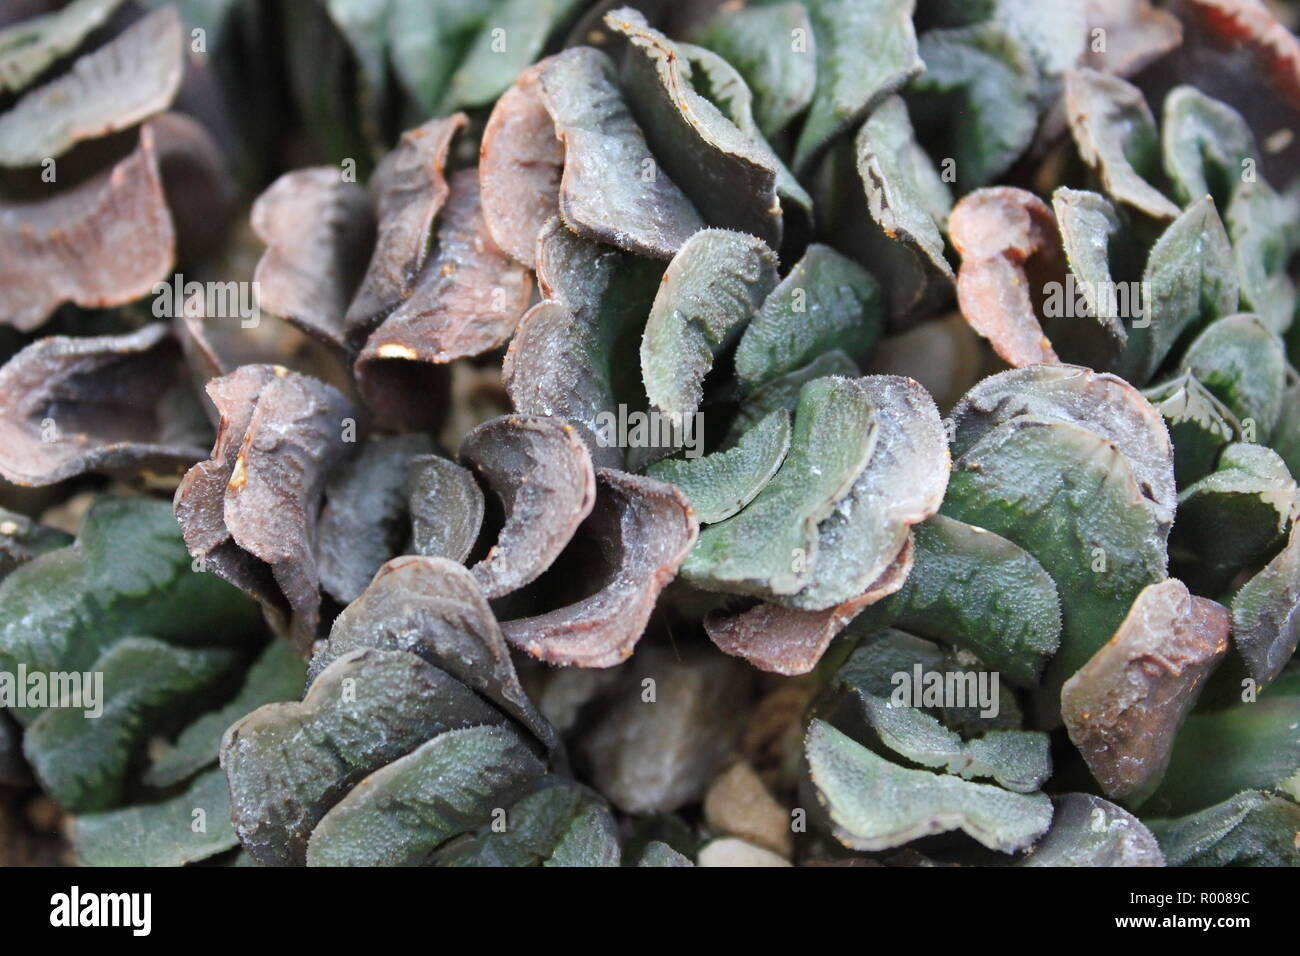 Haworthia truncata, clipped window plant, horse's teeth, H. truncata as an ornamental succulent desert plant growing in an arid environment. - Stock Image